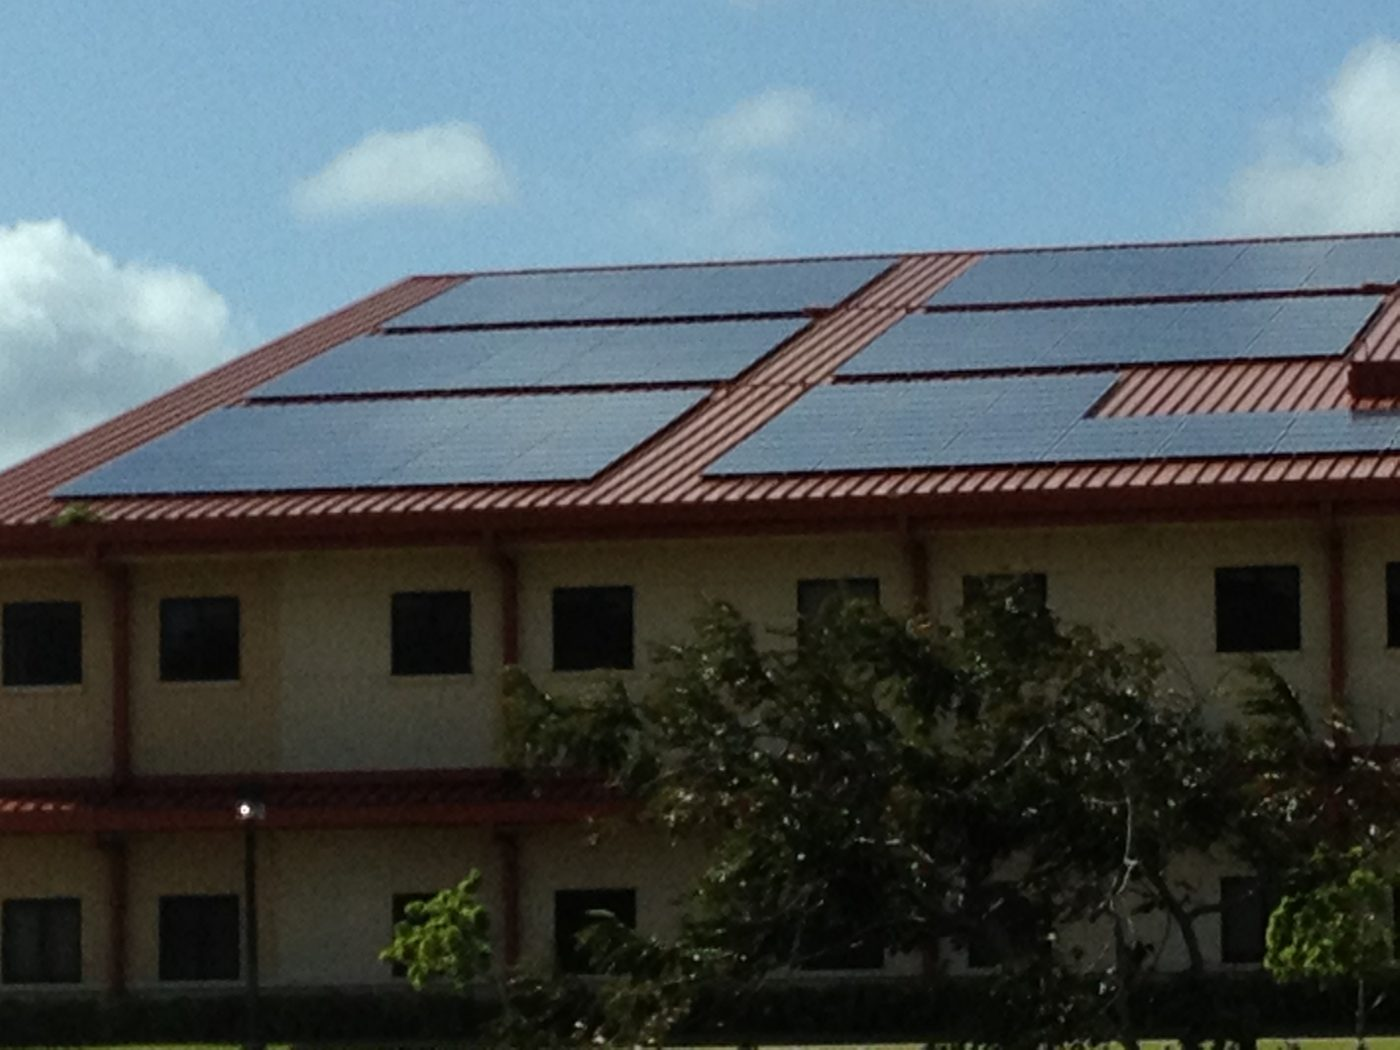 kauai-community-college-with-solar-panels-2012-close